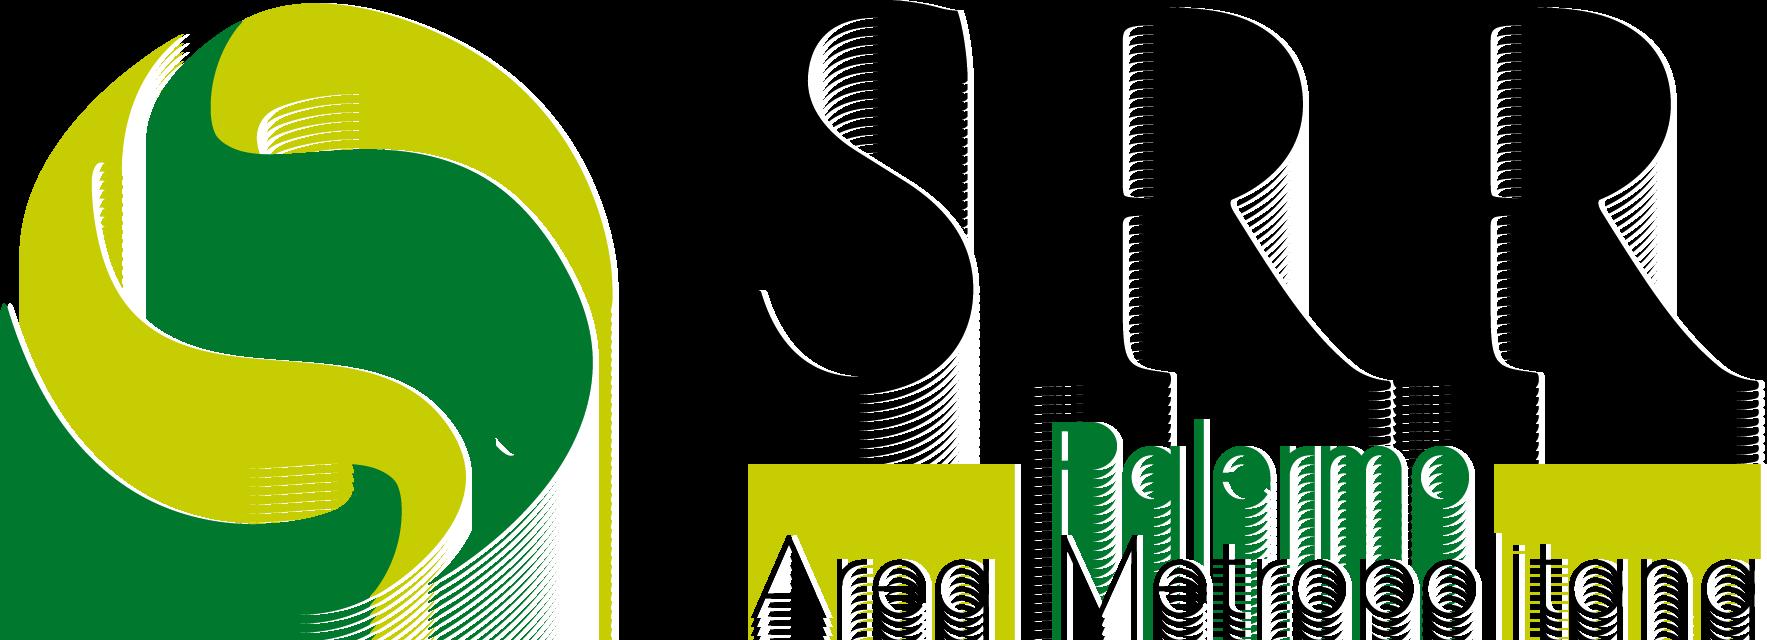 SRR Palermo Area Metropolitana